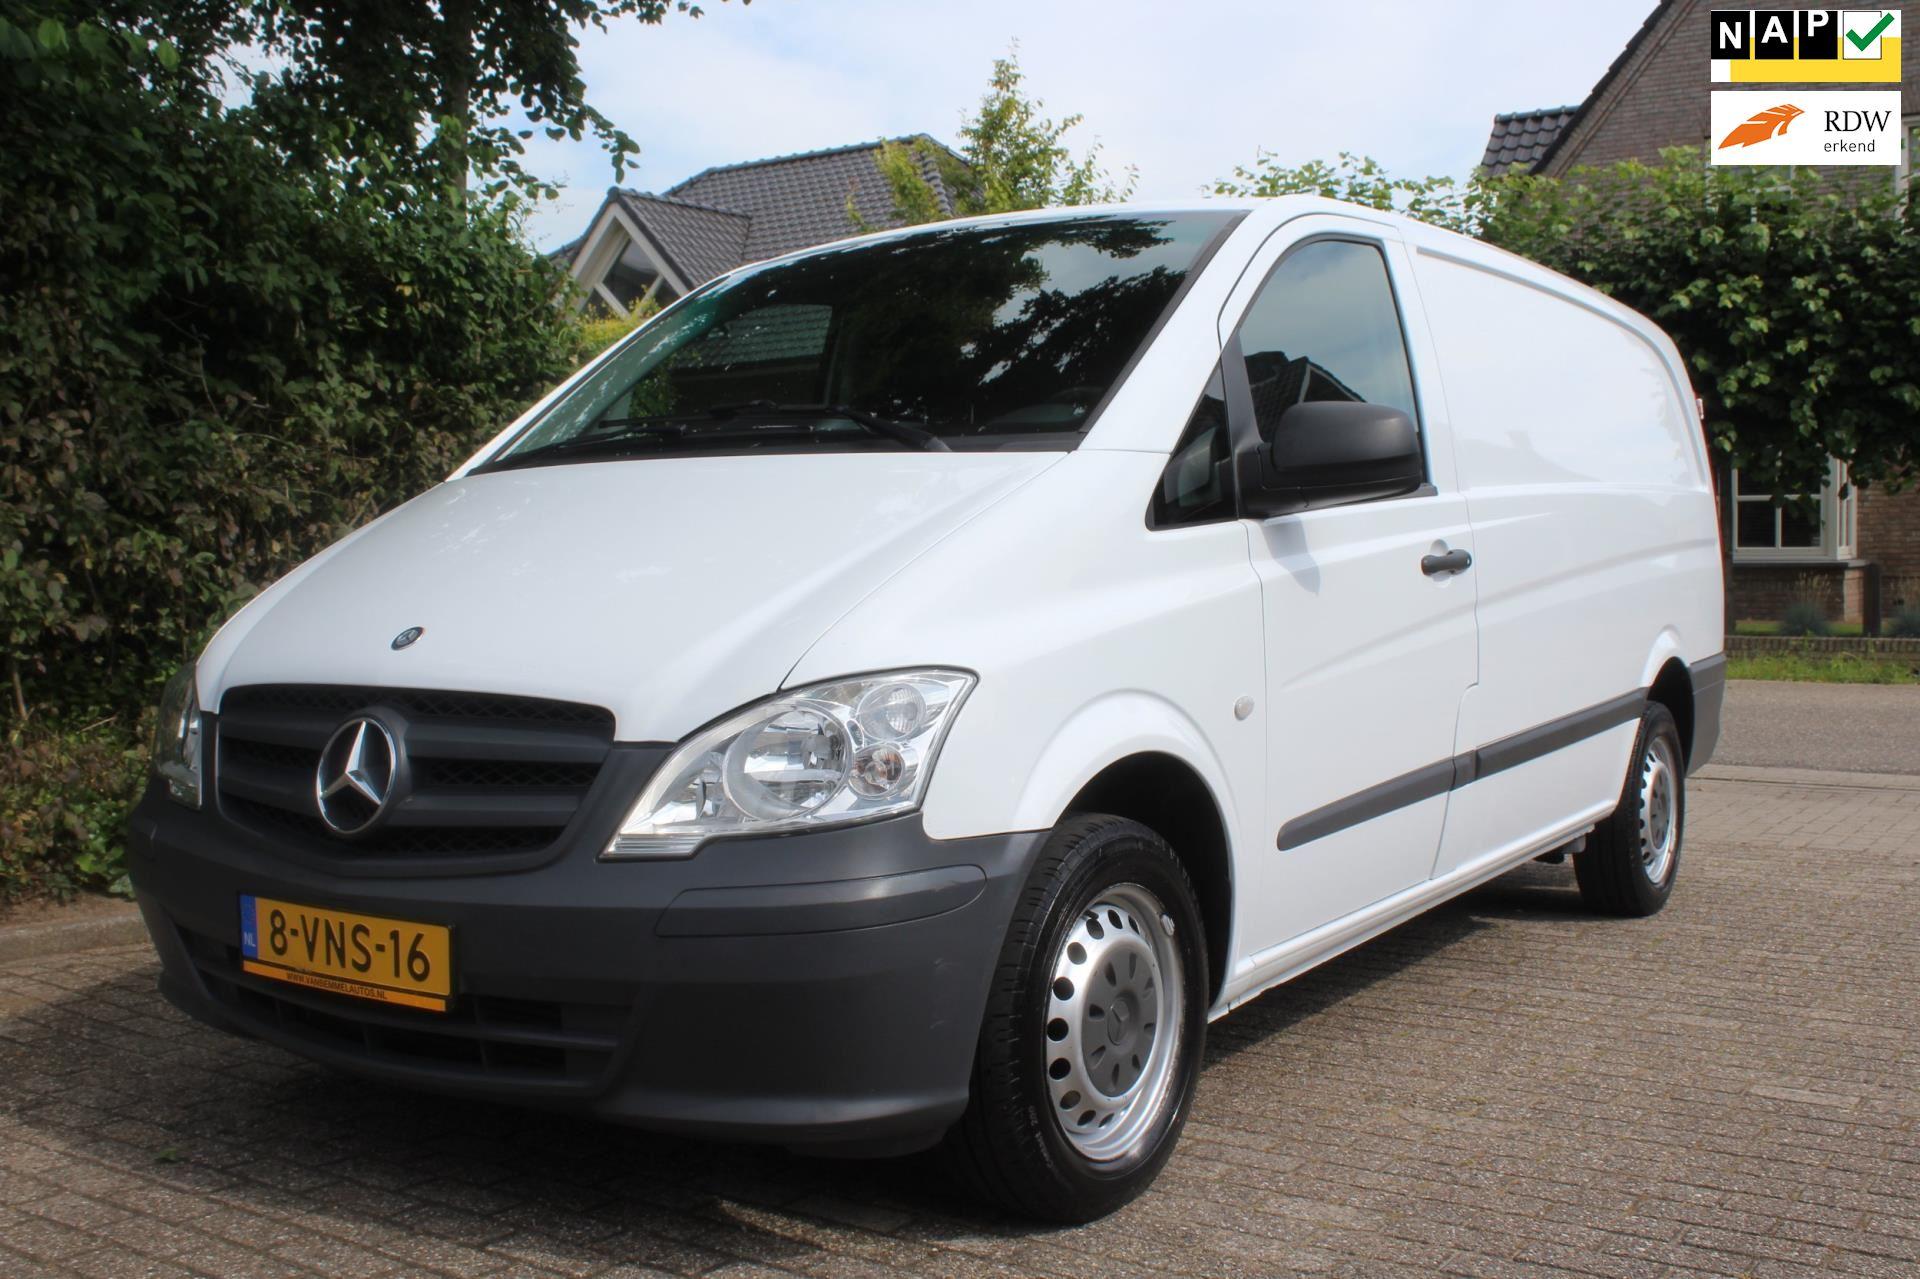 Mercedes-Benz Vito occasion - Autogroothandel Ammerzoden